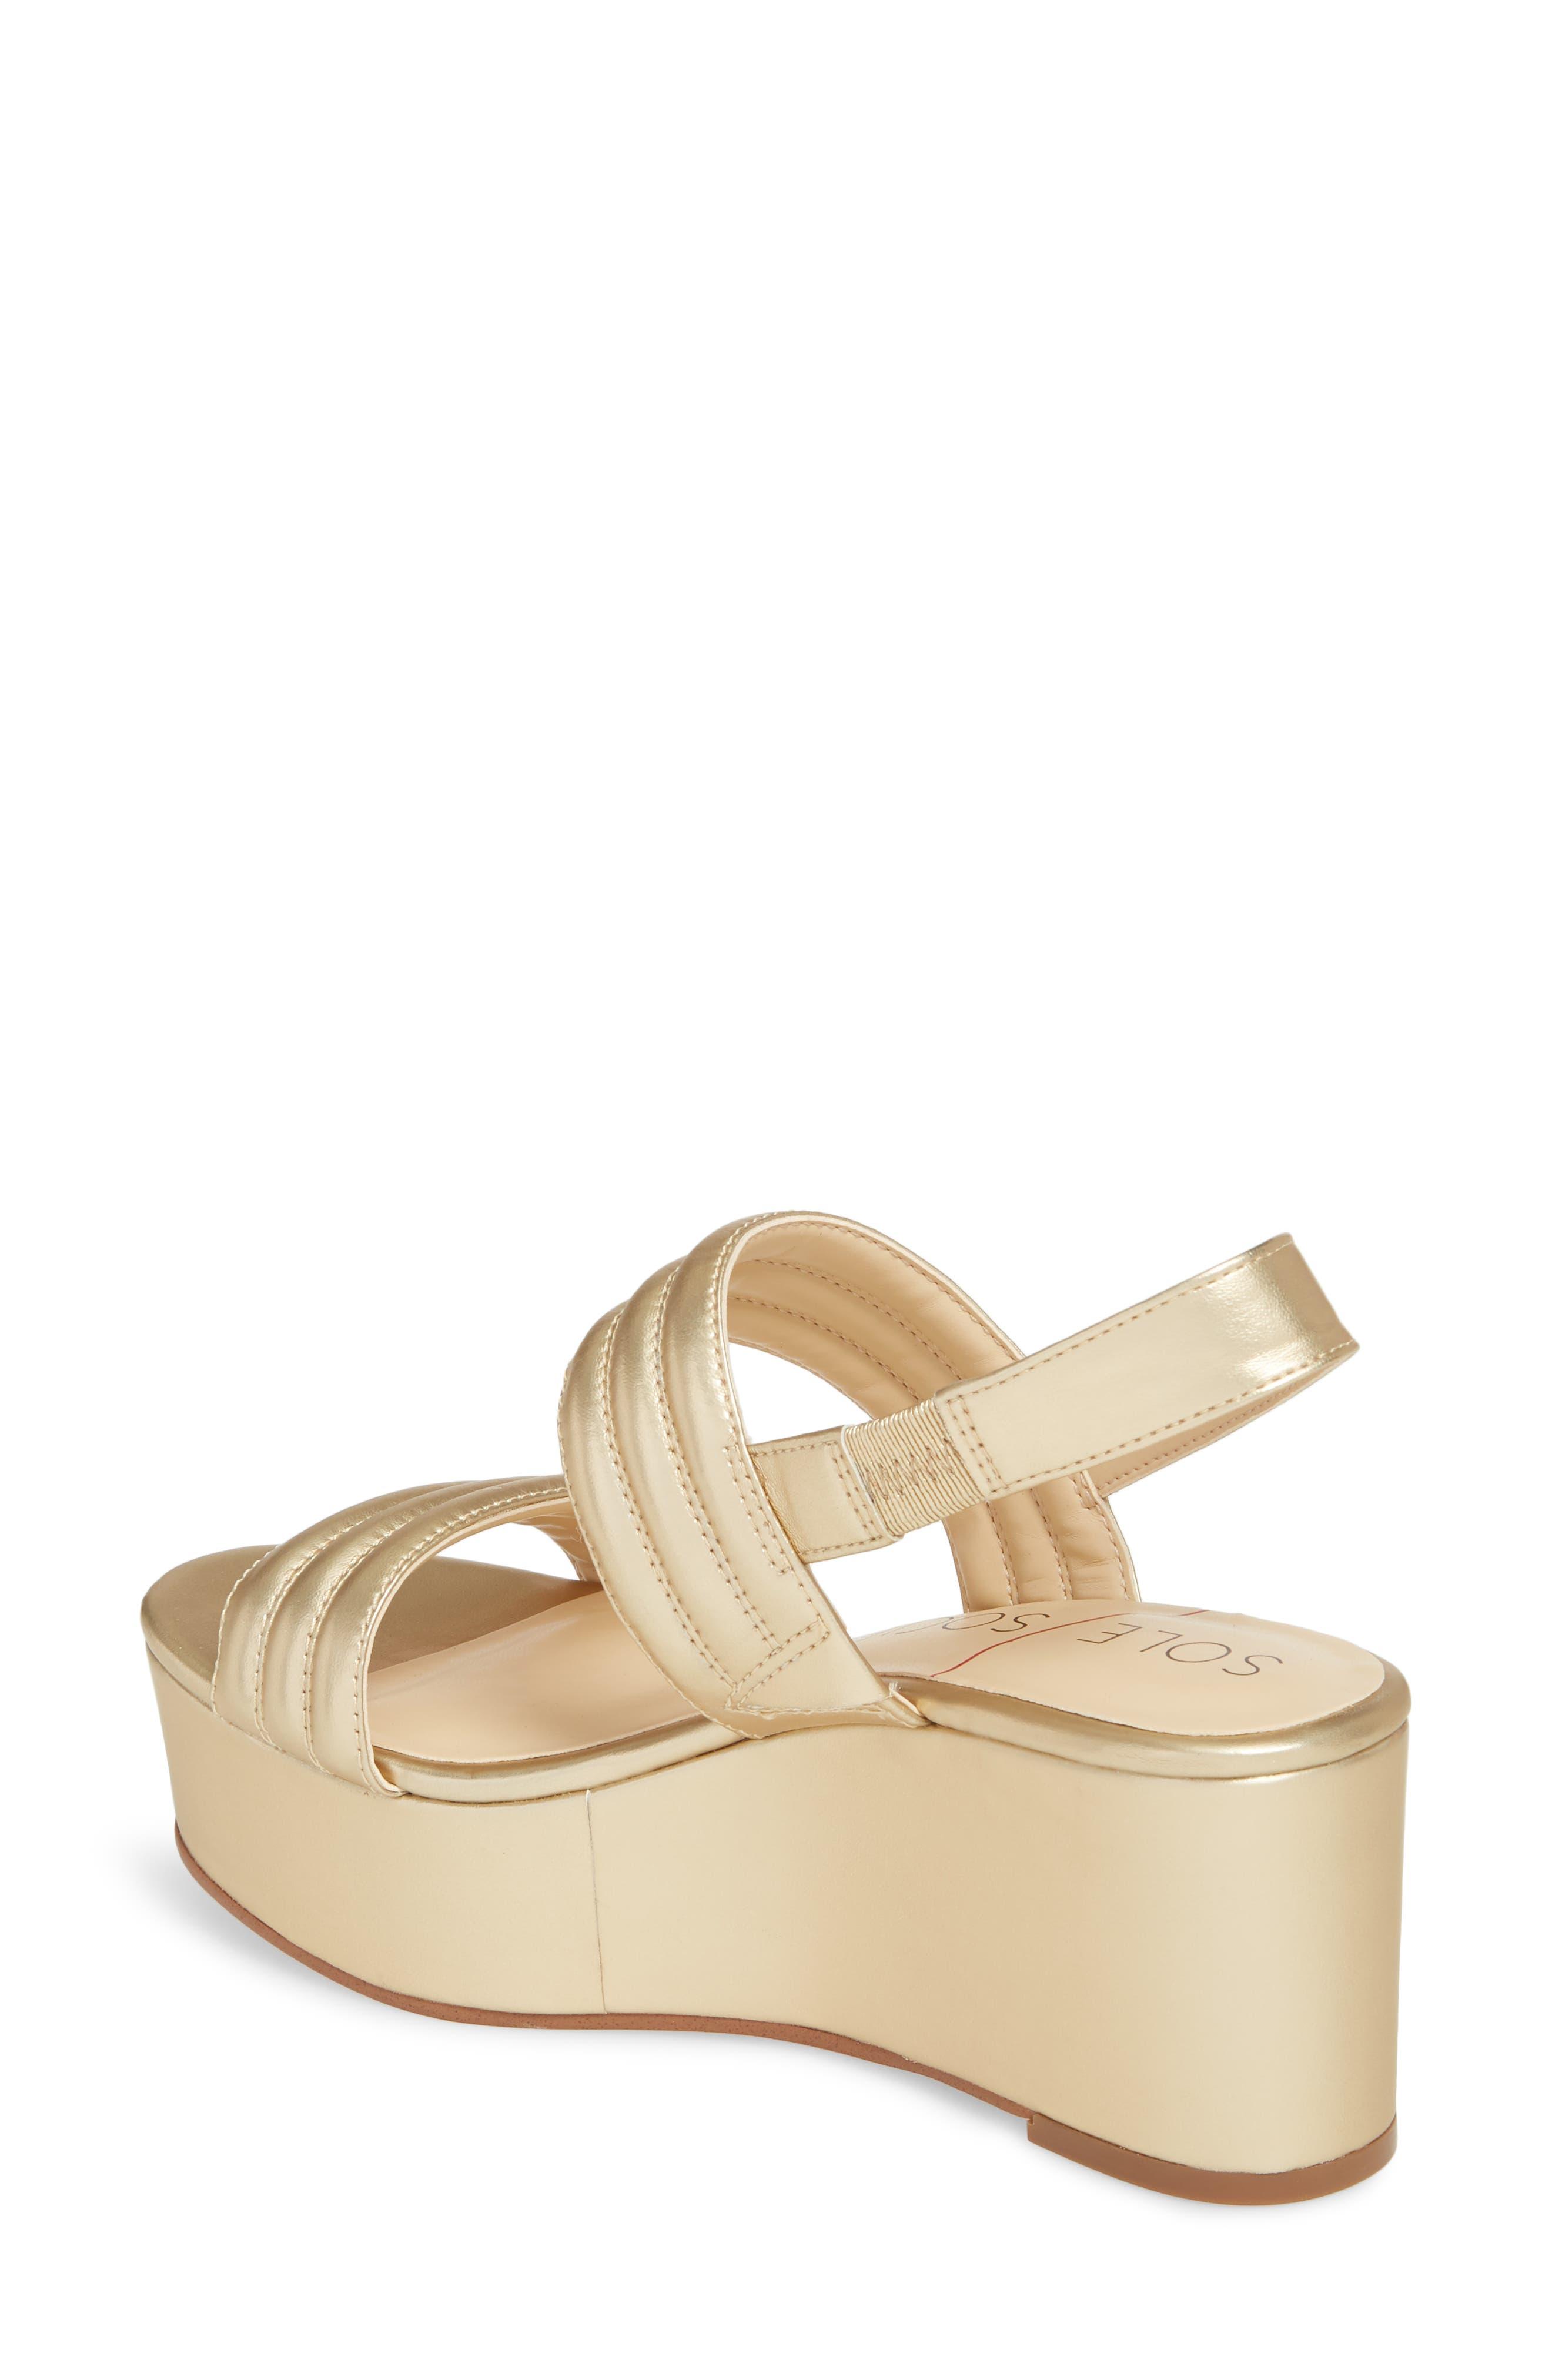 Amberly Platform Sandal,                             Alternate thumbnail 6, color,